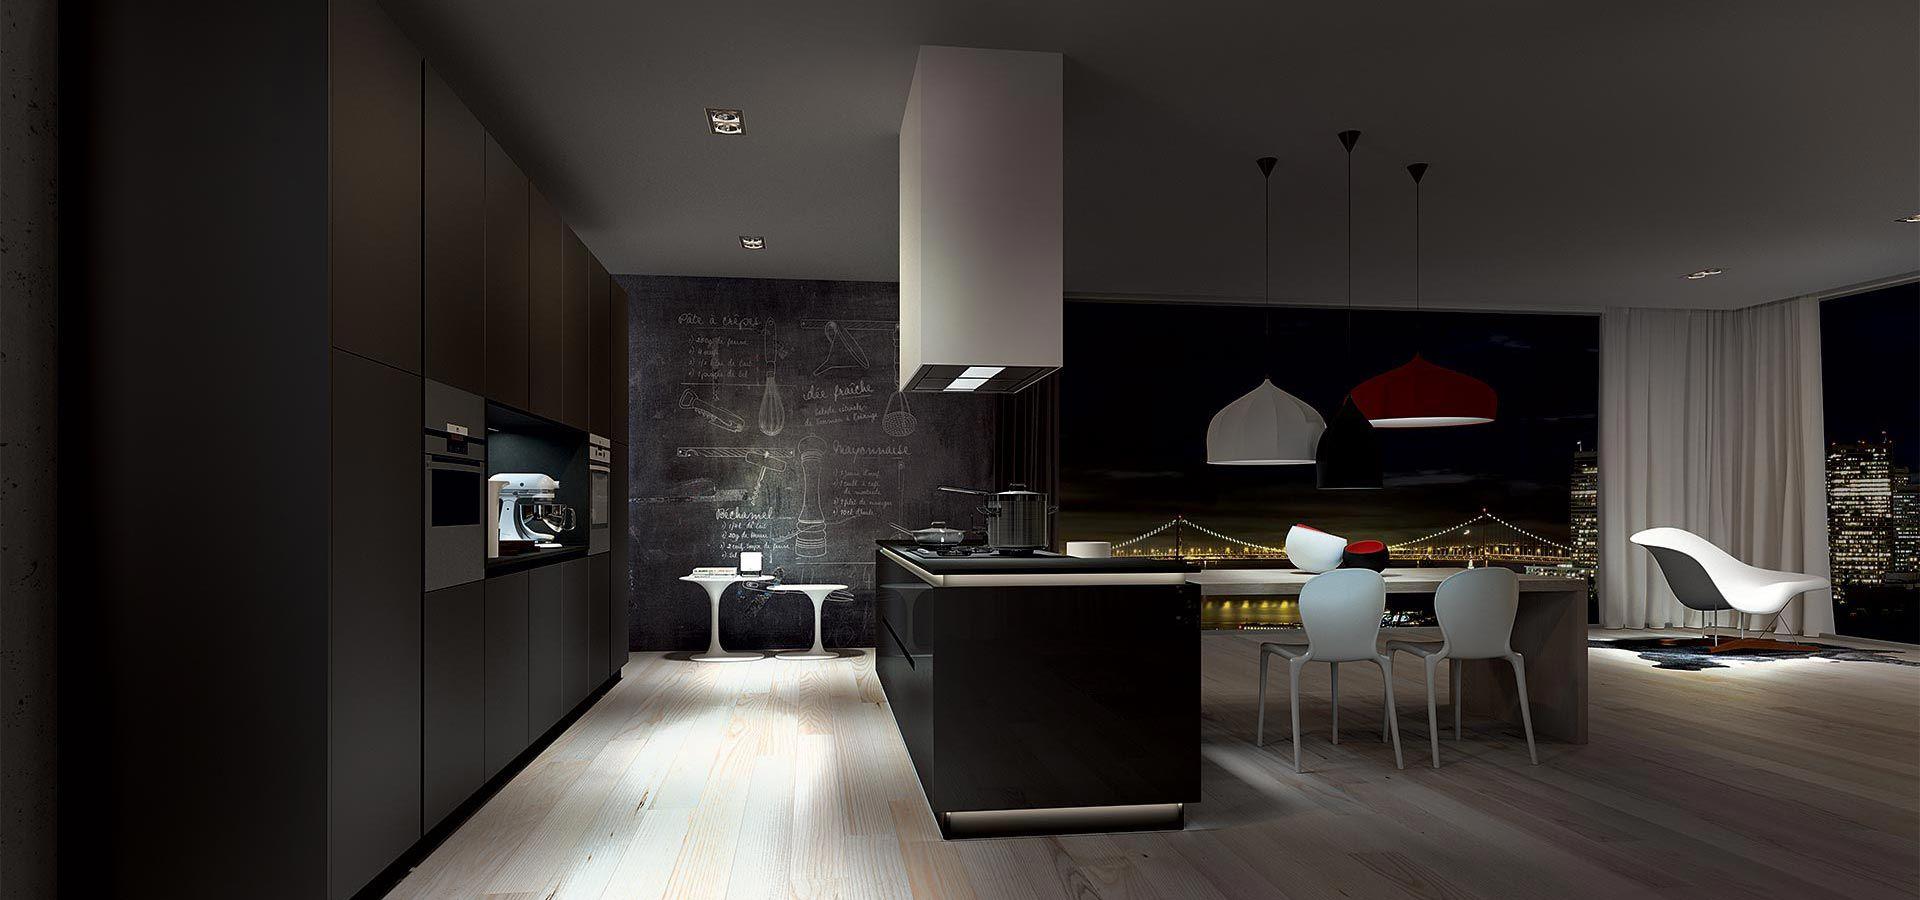 46 best Cucine Arredo 3 images on Pinterest | Contemporary unit ...